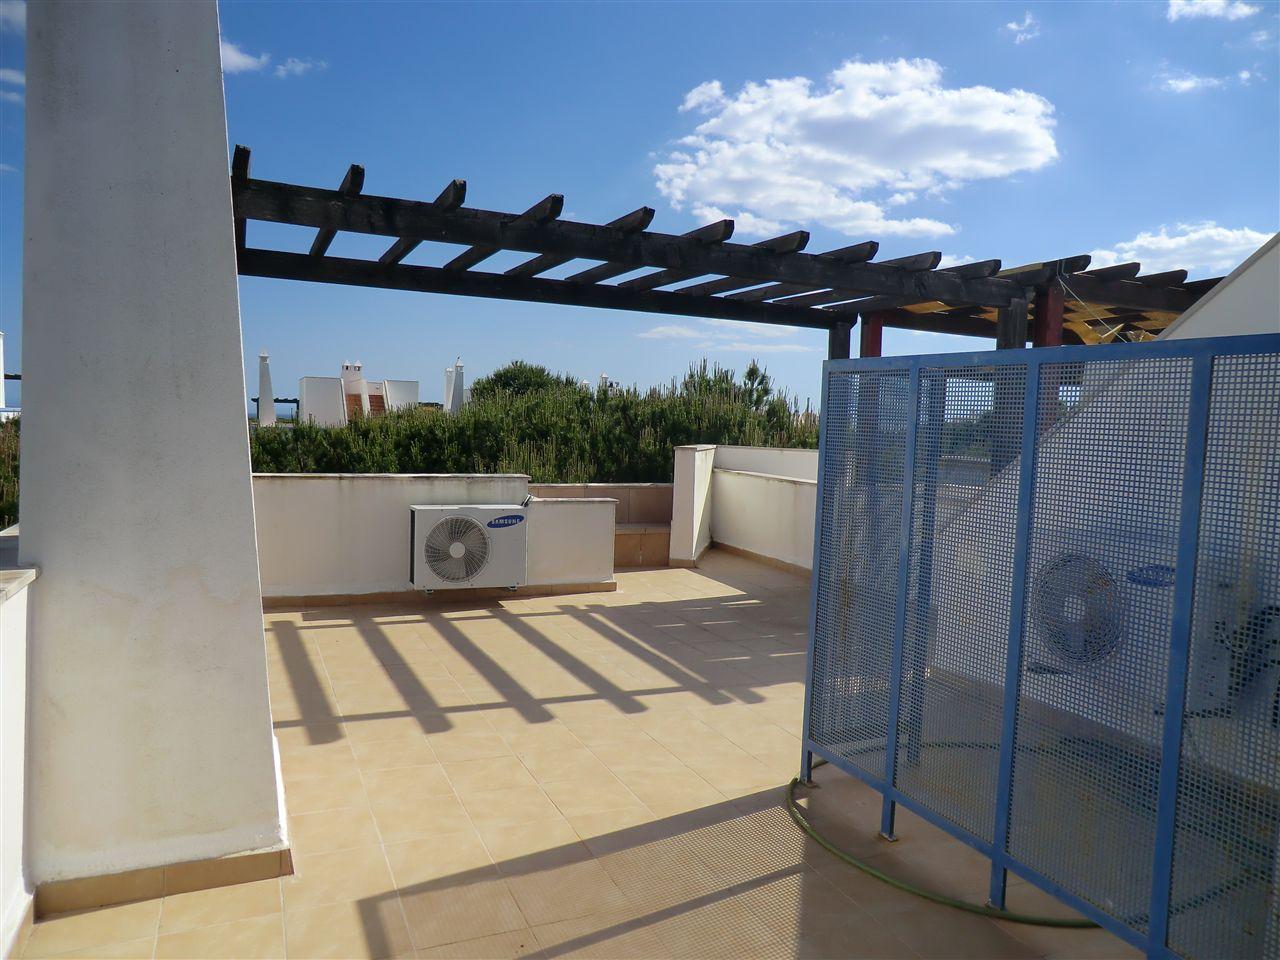 Moradia em Banda T3 - Algarve, Praia Verde, Castro Marim